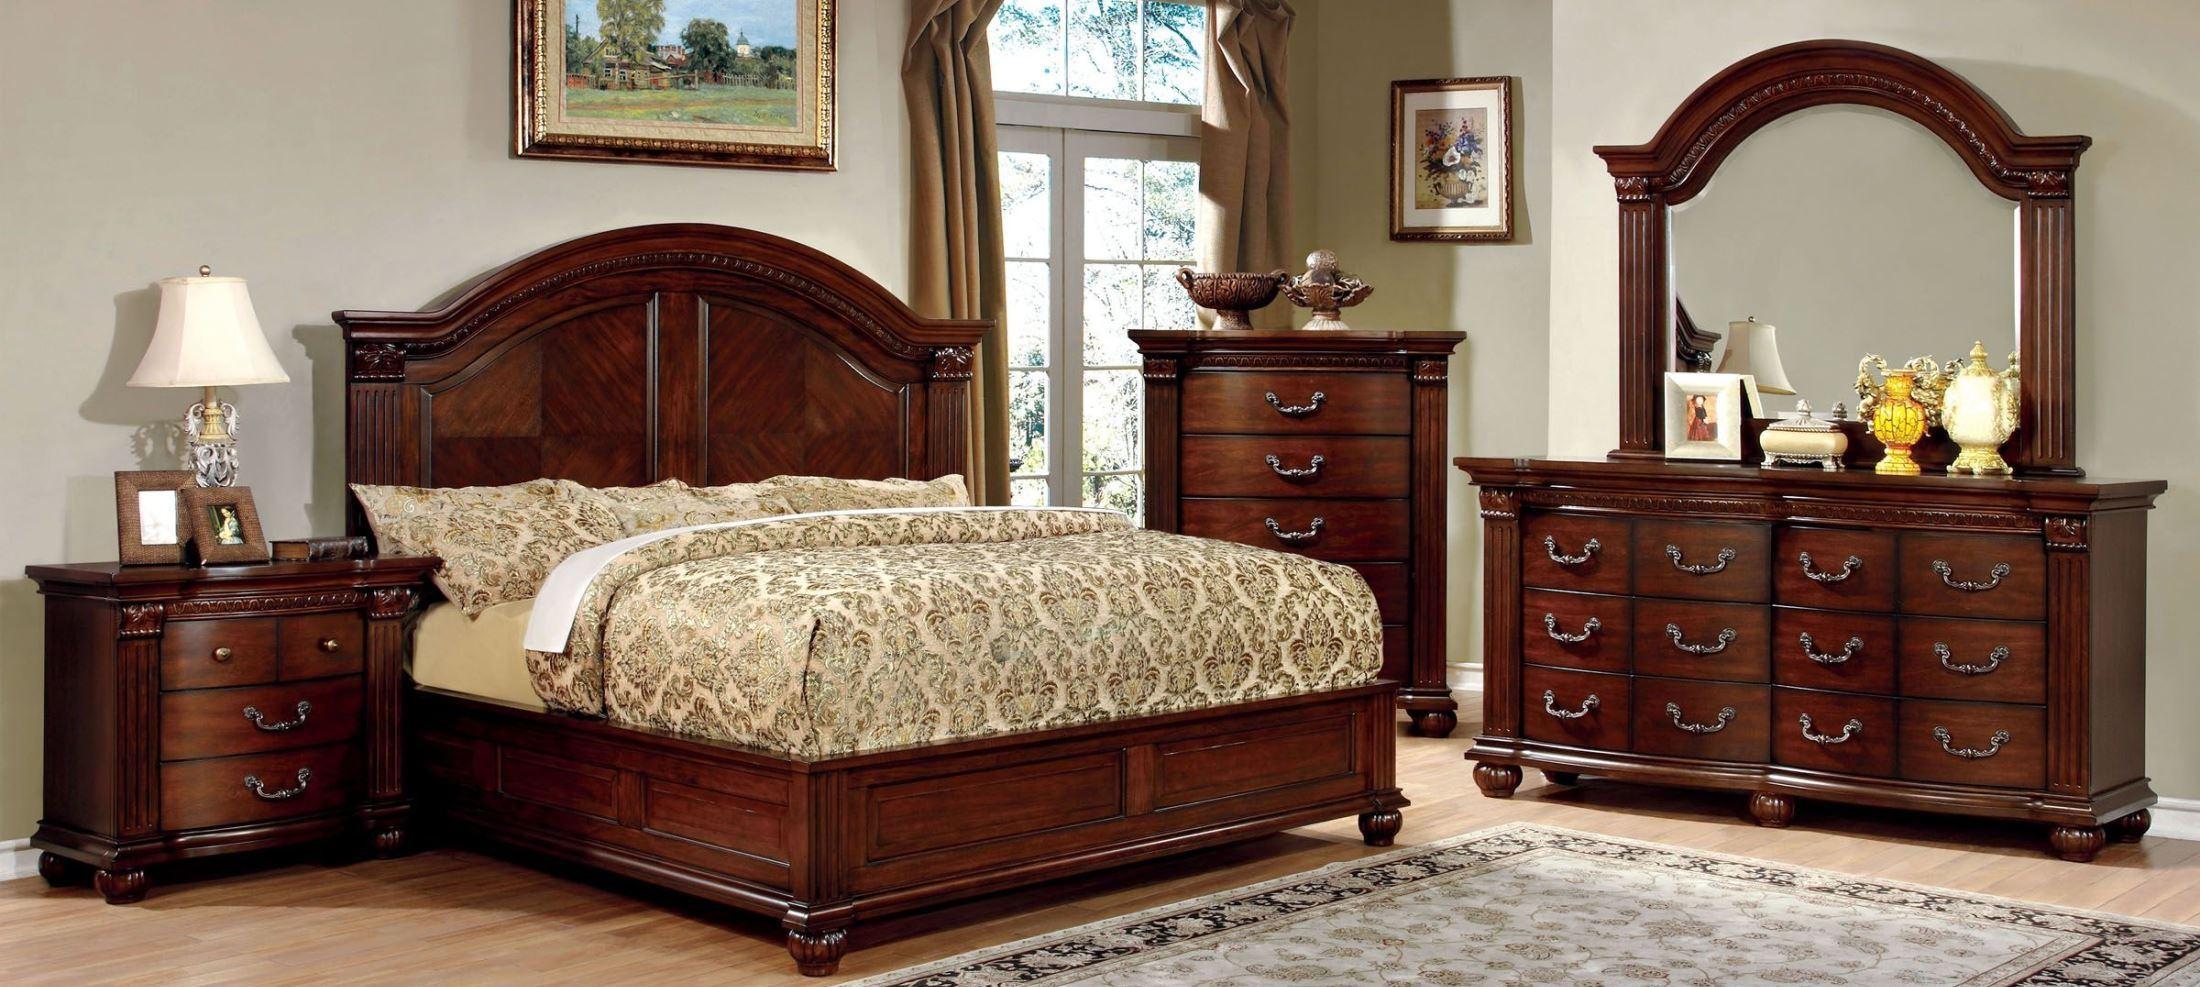 Grandom cherry bedroom set from furniture of america for Cherry bedroom furniture